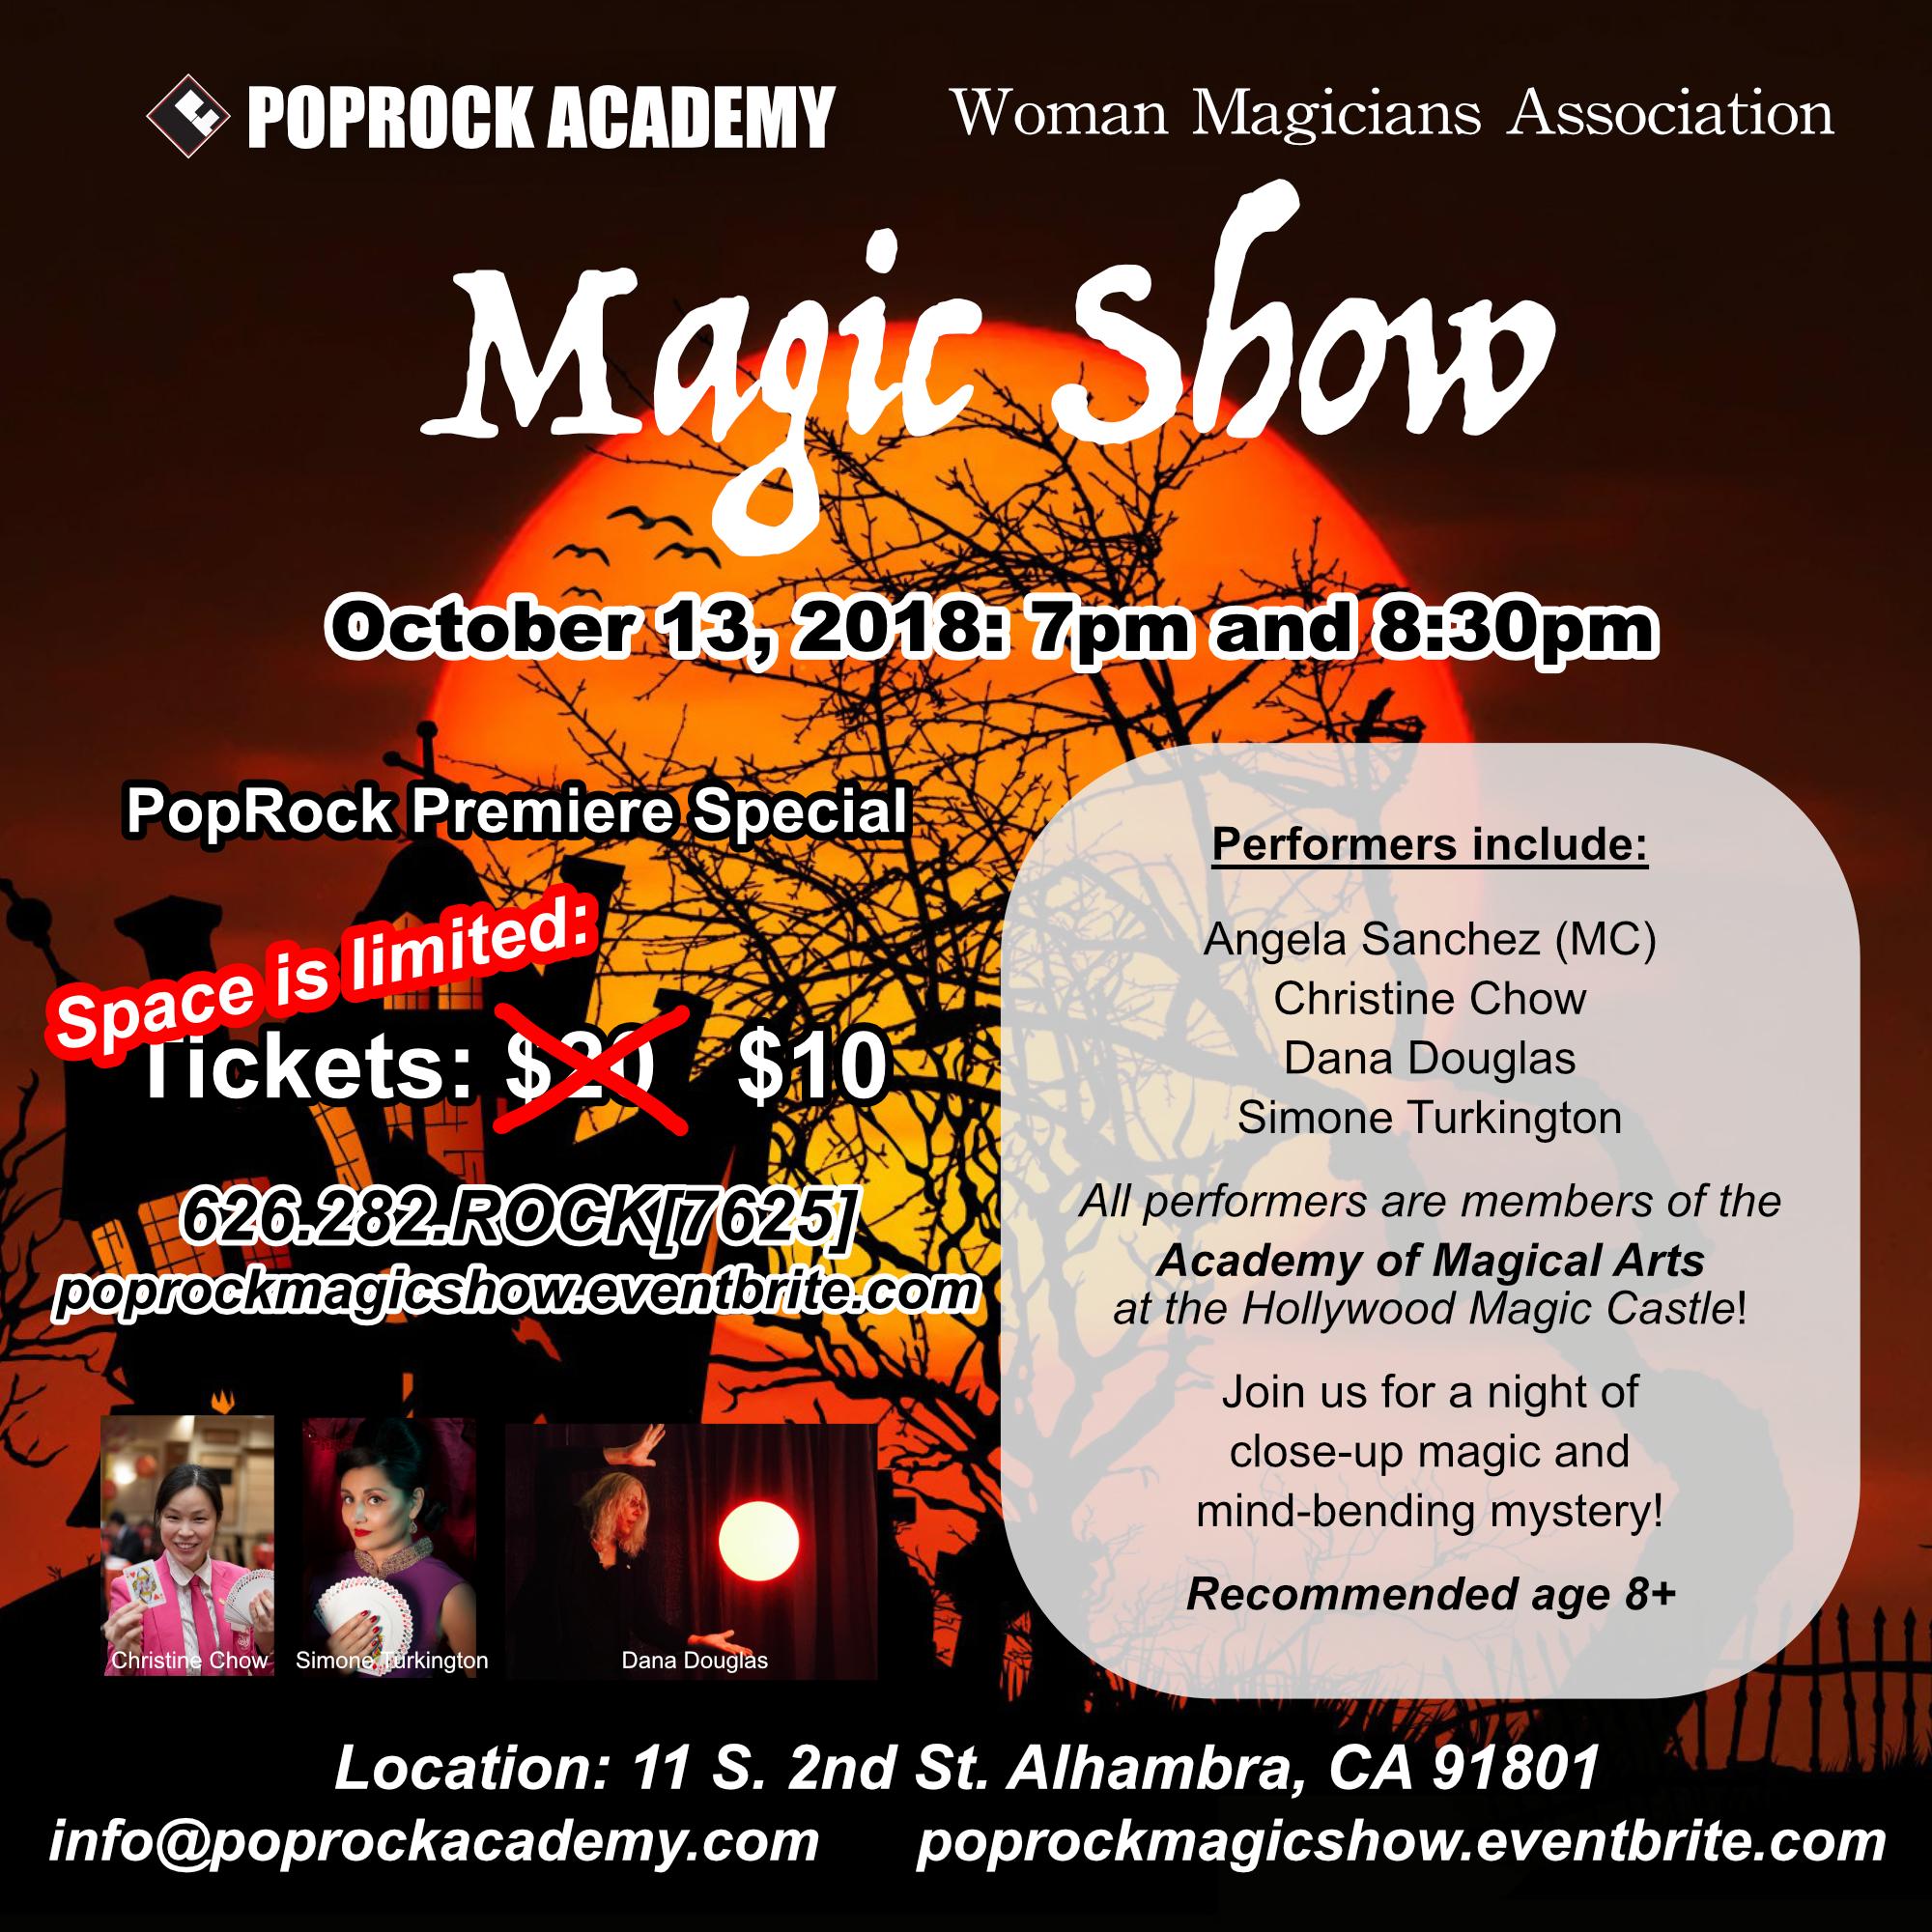 PopRock academy magic show - October 13th, 2018